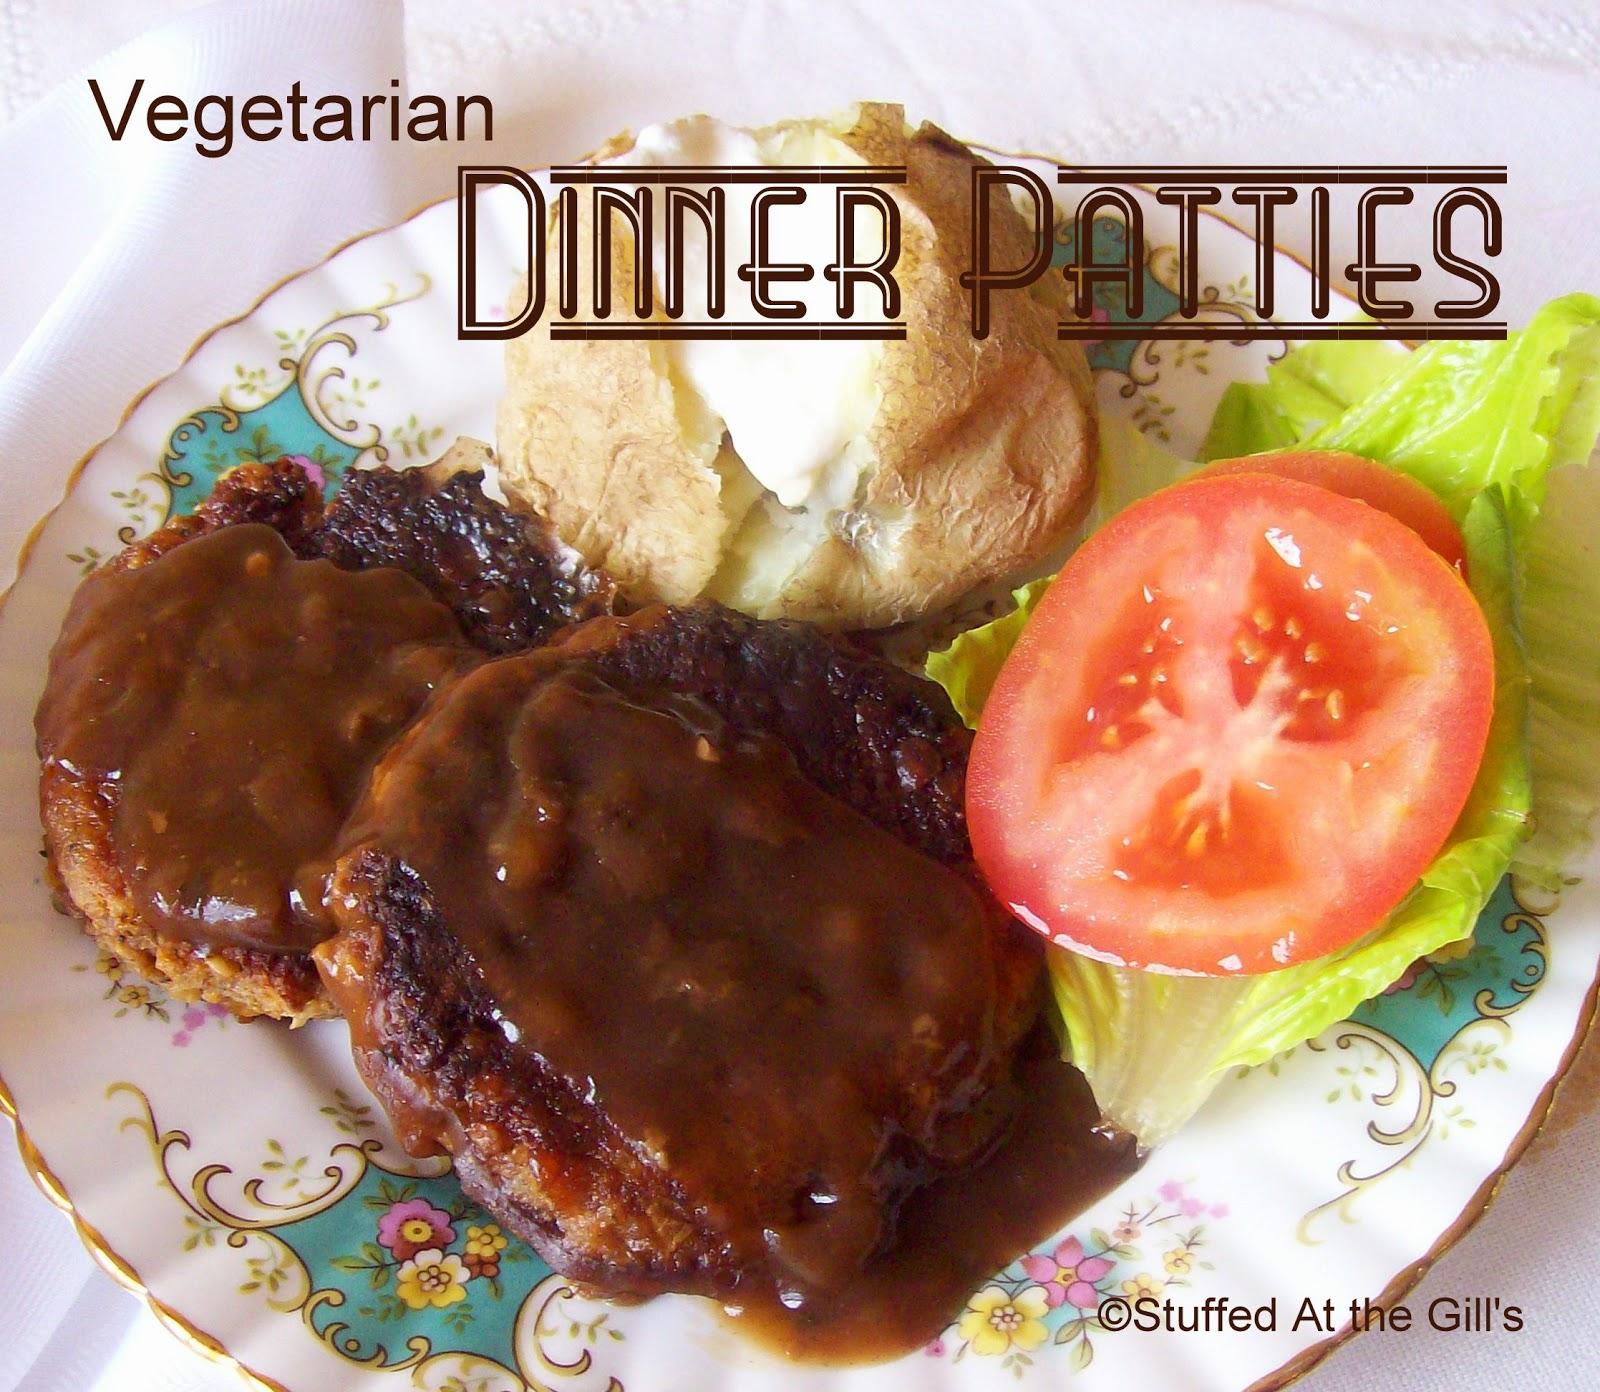 Vegetarian Dinner Patties served with gravy.